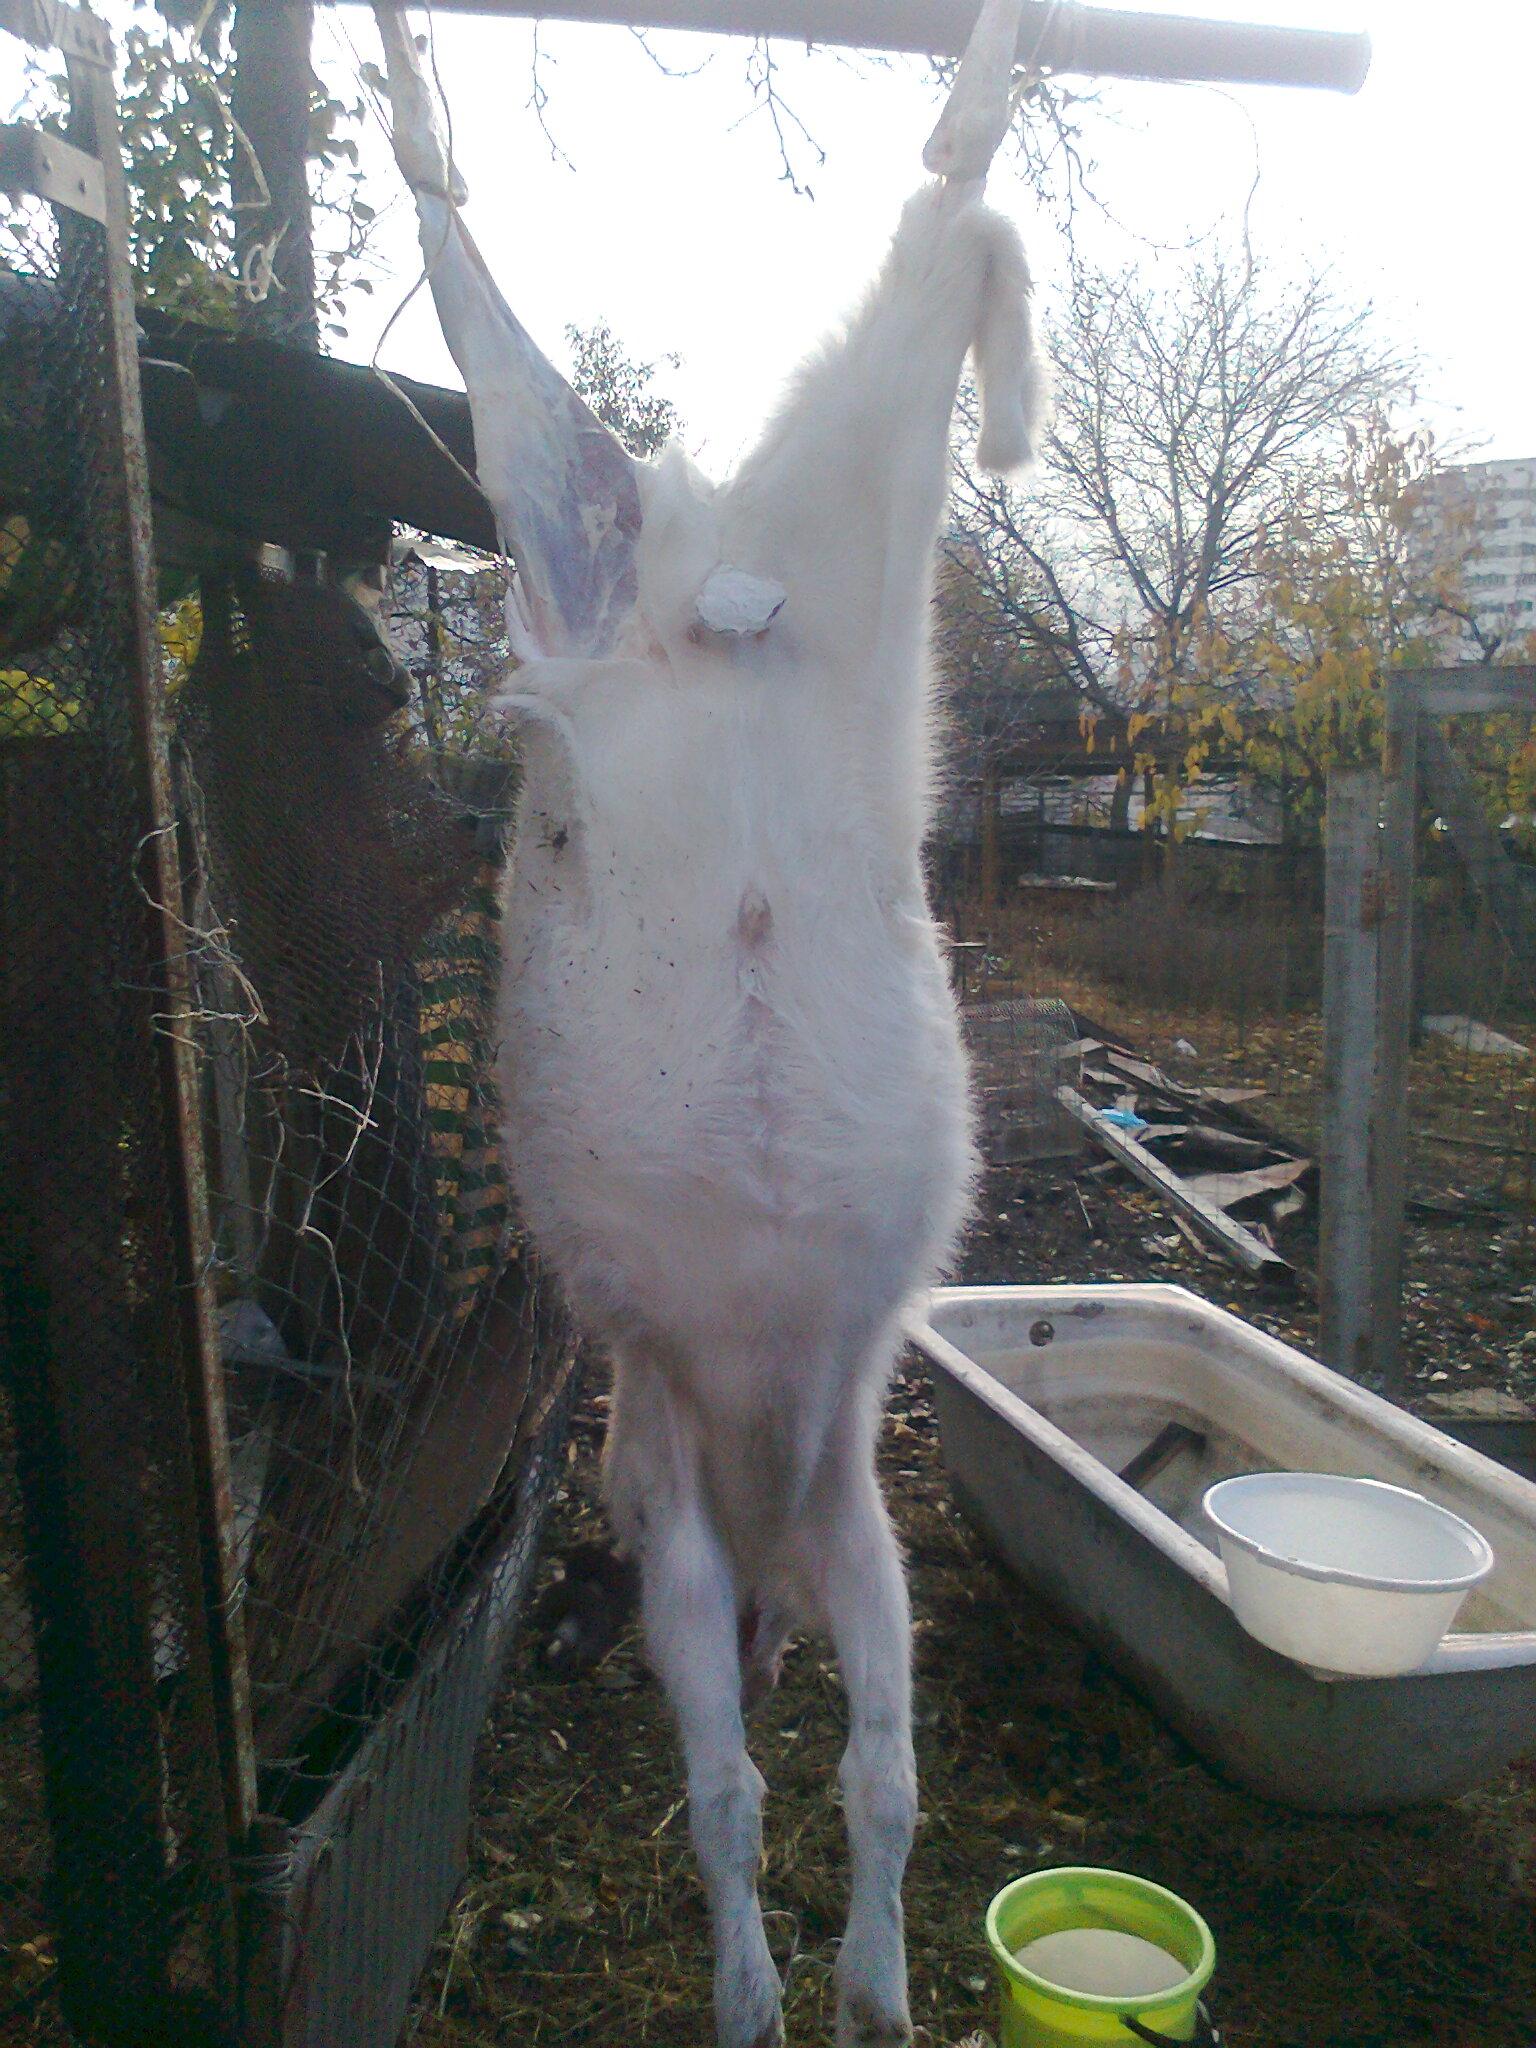 Понос у козлят: чем лечат в домашних условиях? 83